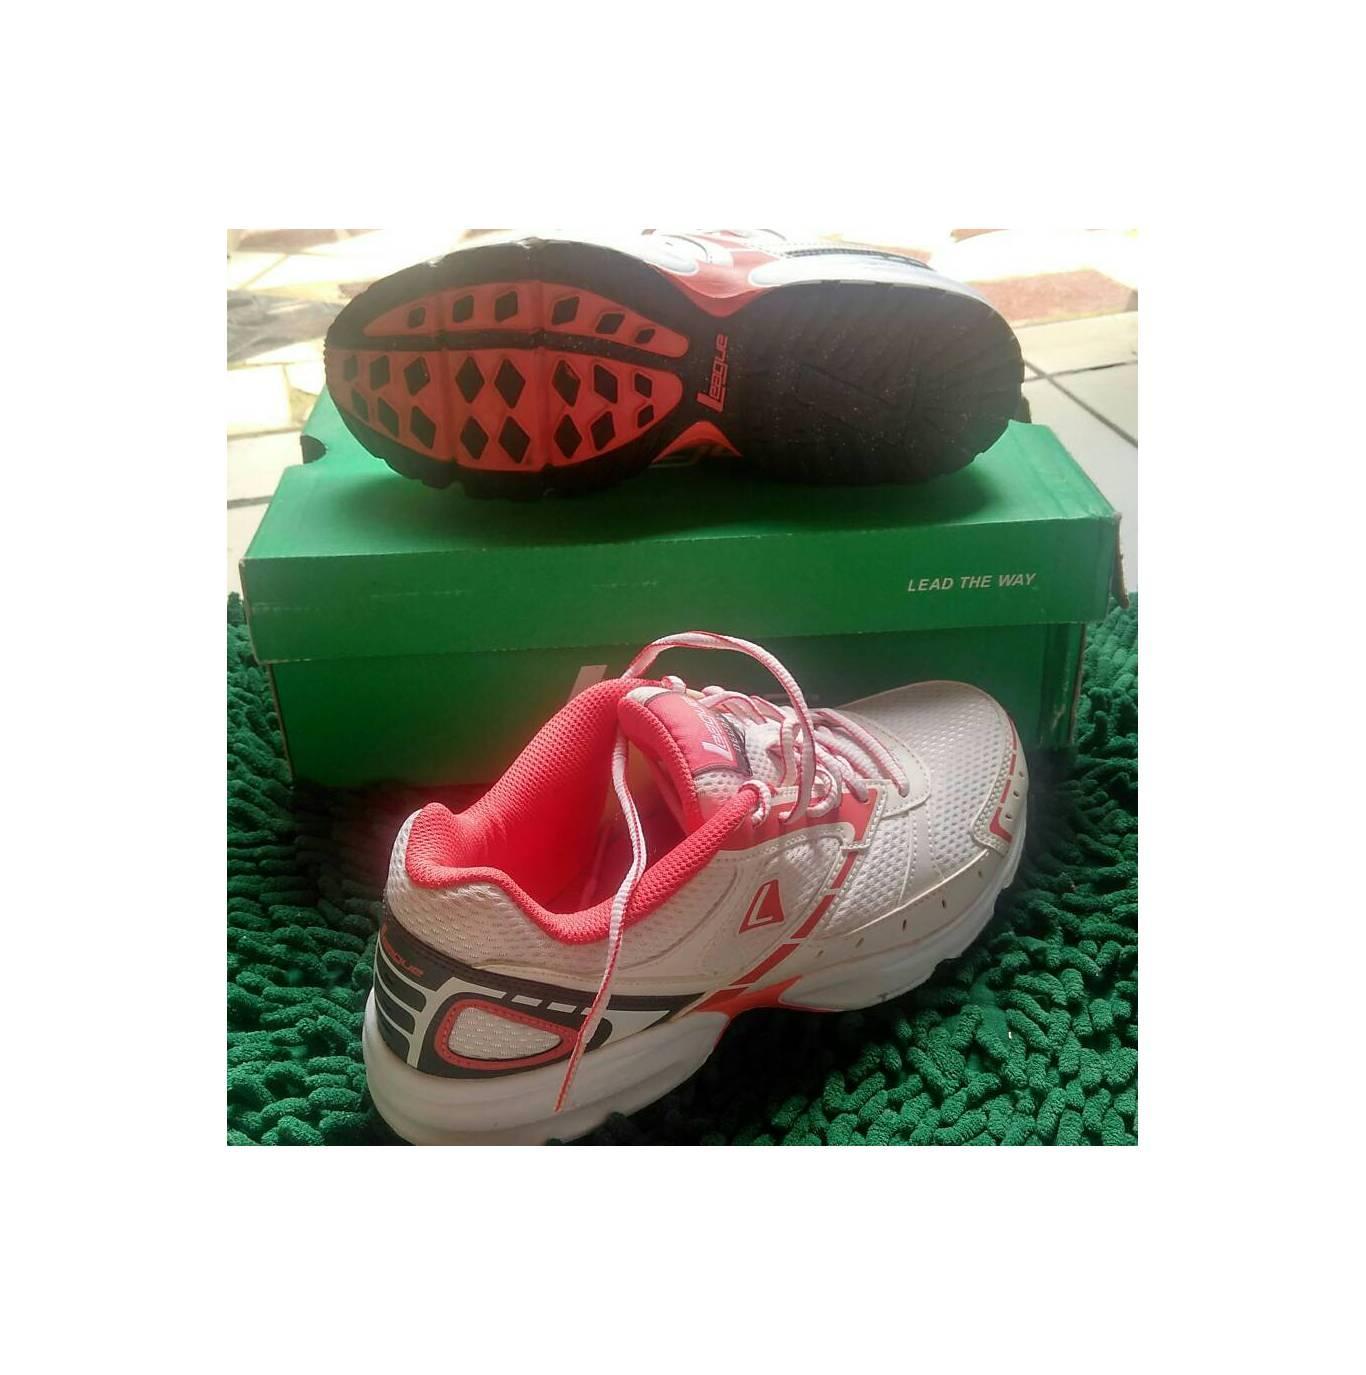 League Legas Series Iron La W Sepatu Lari Wanita Dark Gull Grey Koga Black Green Running Shoes Decra 3w Originalidr305600 Rp 343200